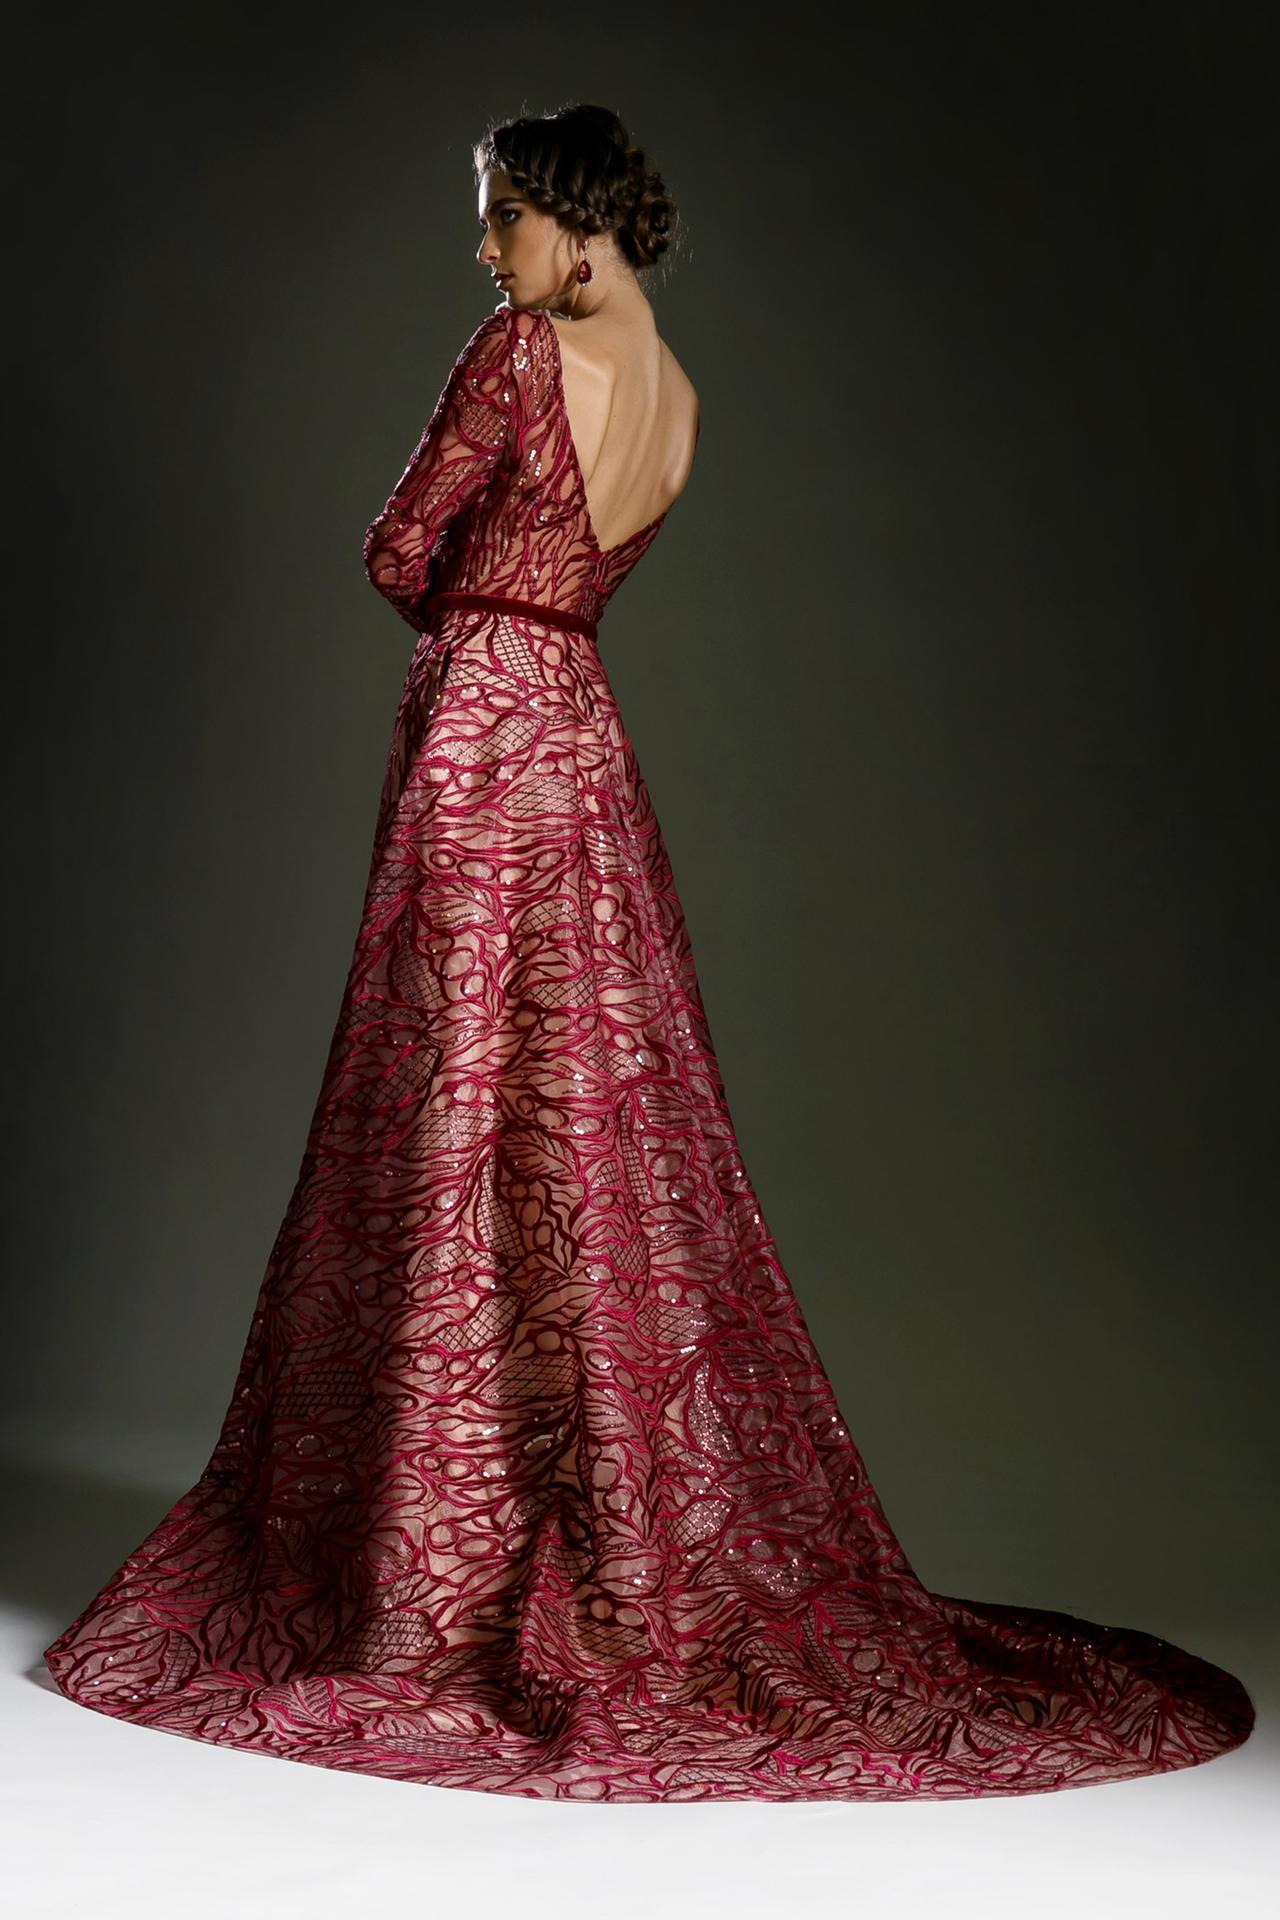 Nové spoločenské šaty :) - Obrázok č. 68